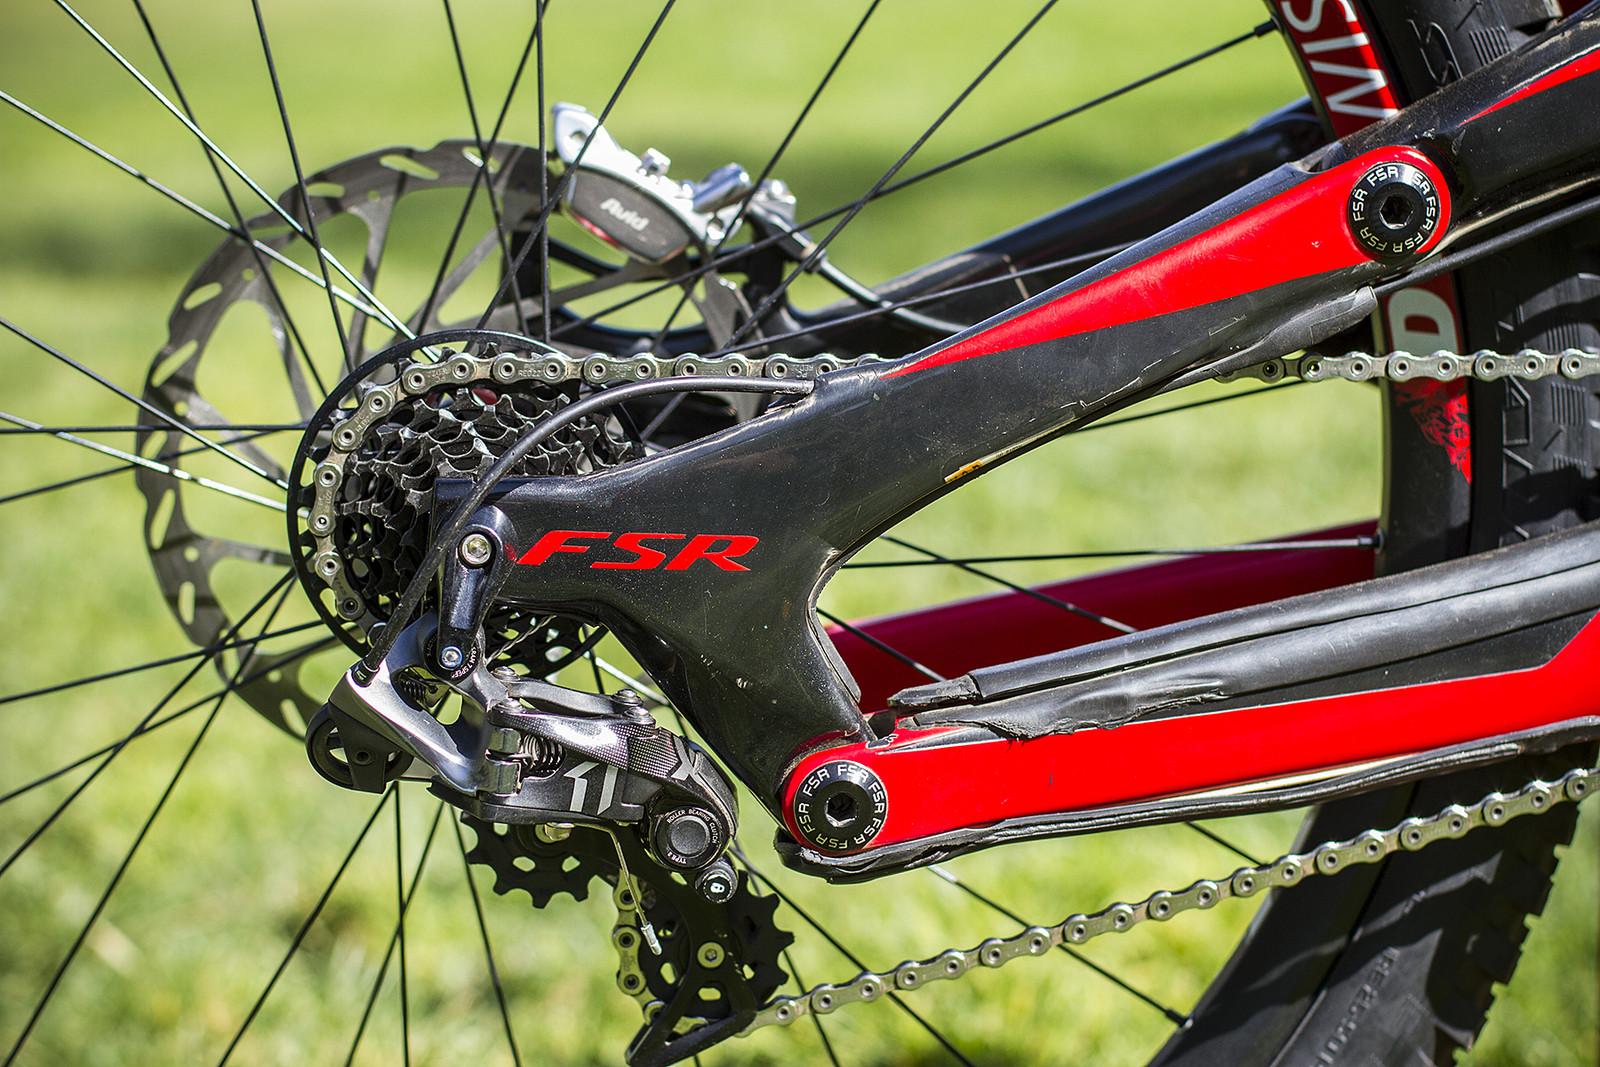 Gwin Runs a 7-Speed SRAM X01 DH Drivetrain - Pro Bike Check: Aaron Gwin's Specialized S-WORKS Demo 8 - Mountain Biking Pictures - Vital MTB